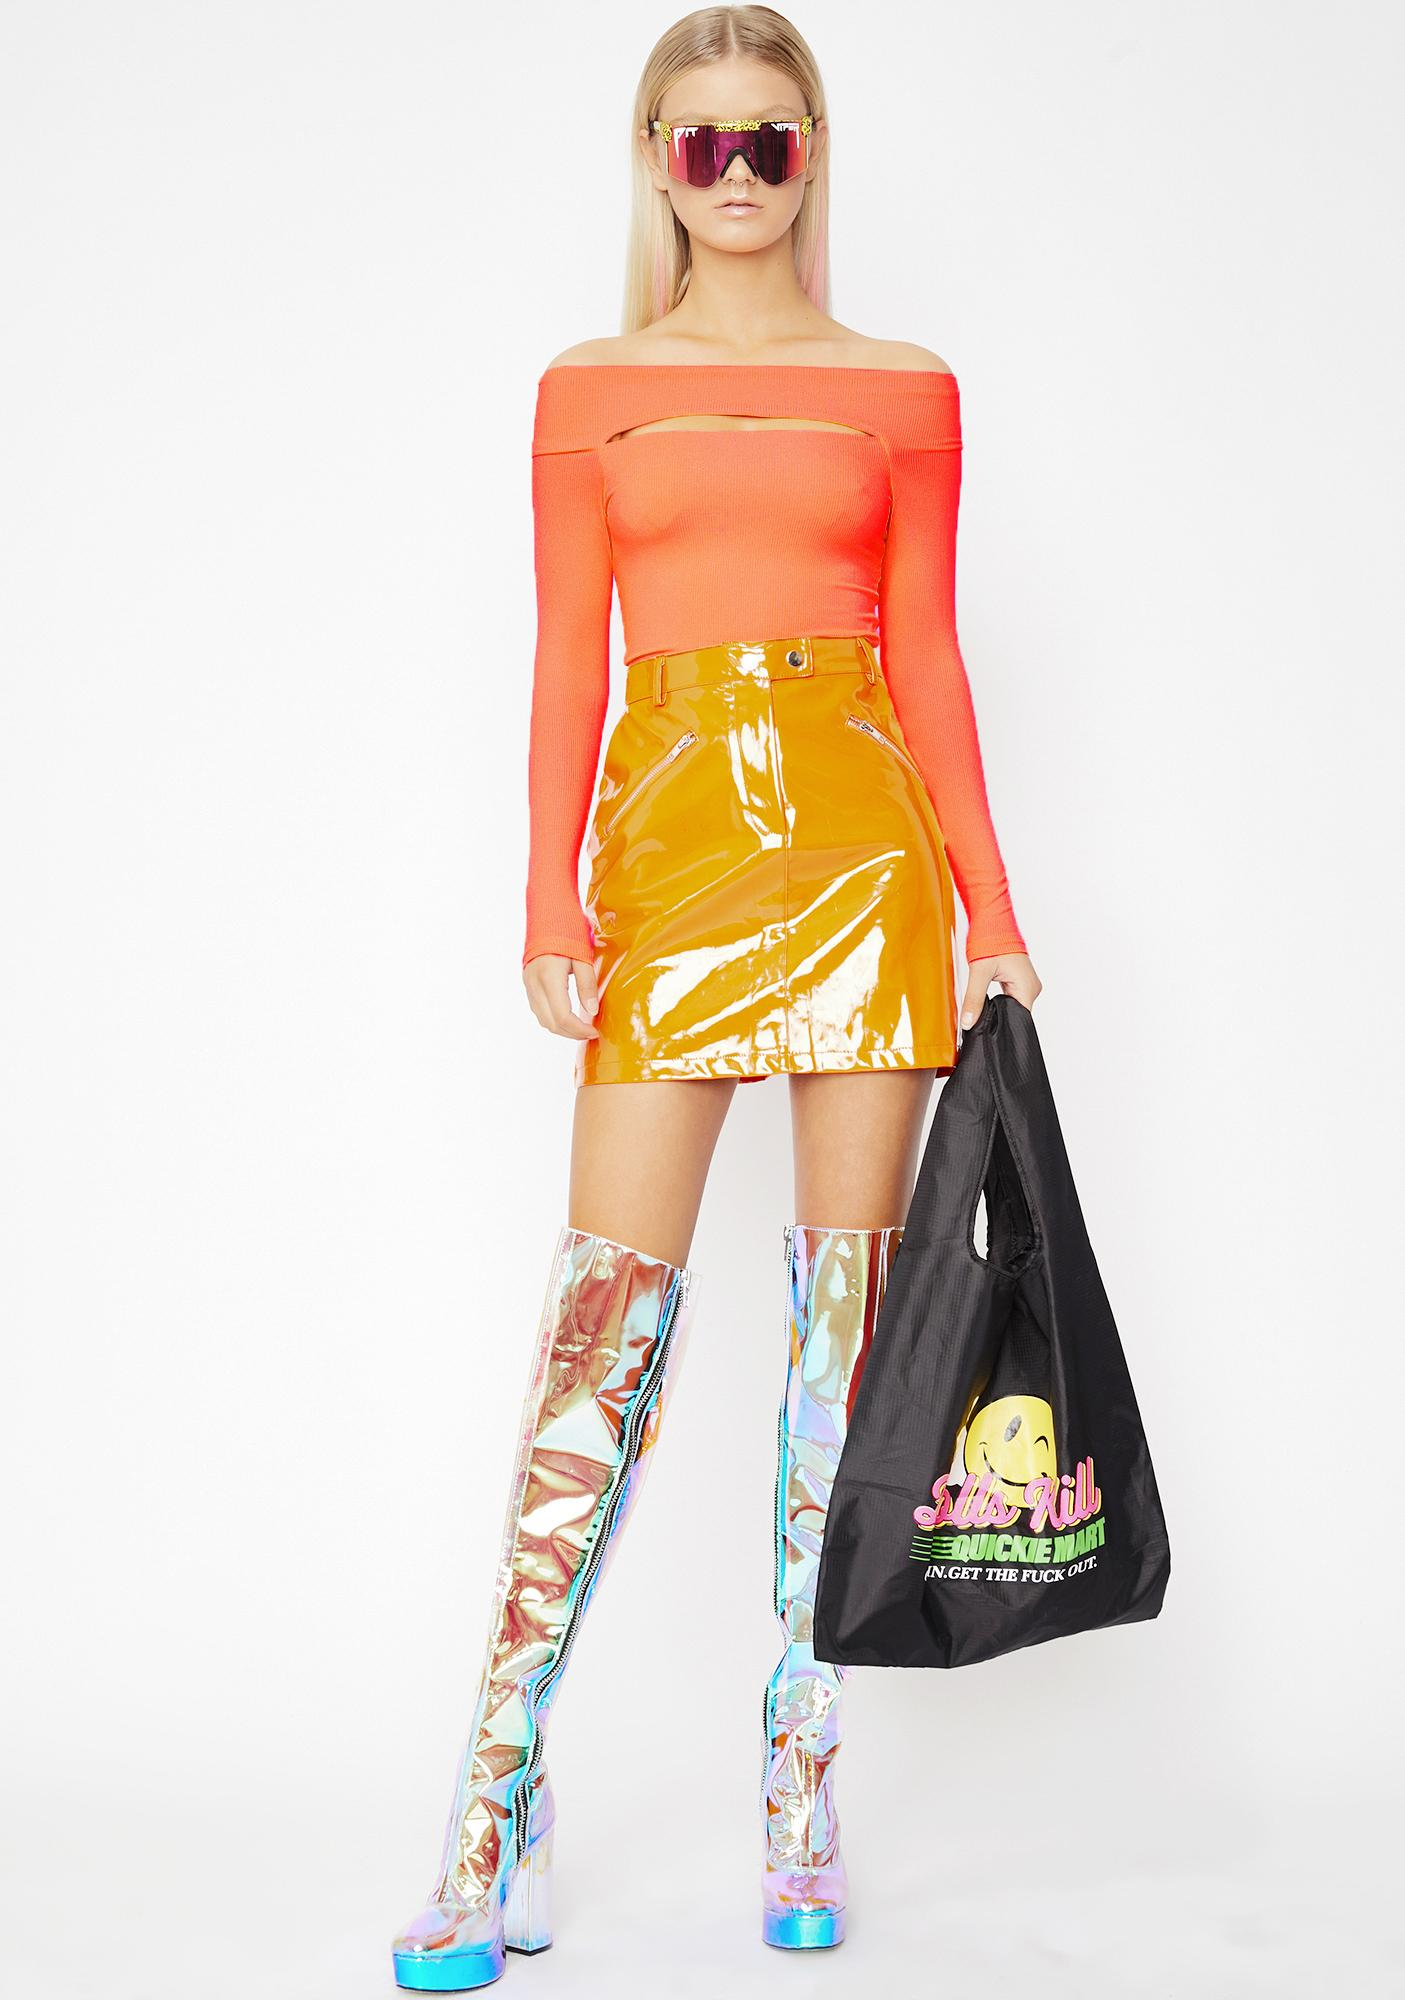 Juicy Venus Delight Cutout Bodysuit